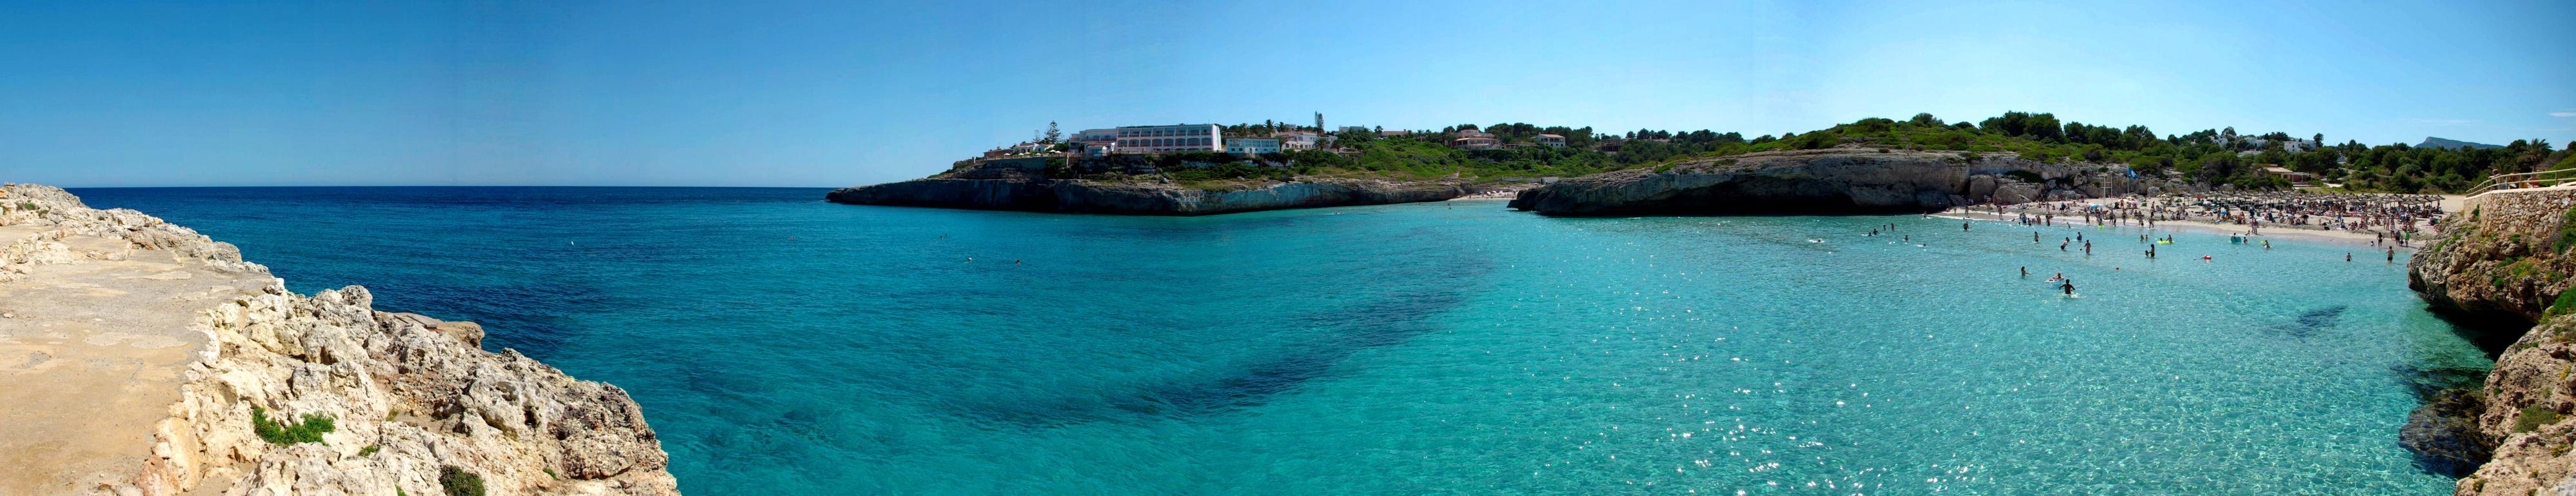 Foto playa Porto Cristo / Platja d´es Port / Coves Blanques. Panoramica Cala Domingos Mallorca - Buy a print in - http://cafate.blogspot.com/